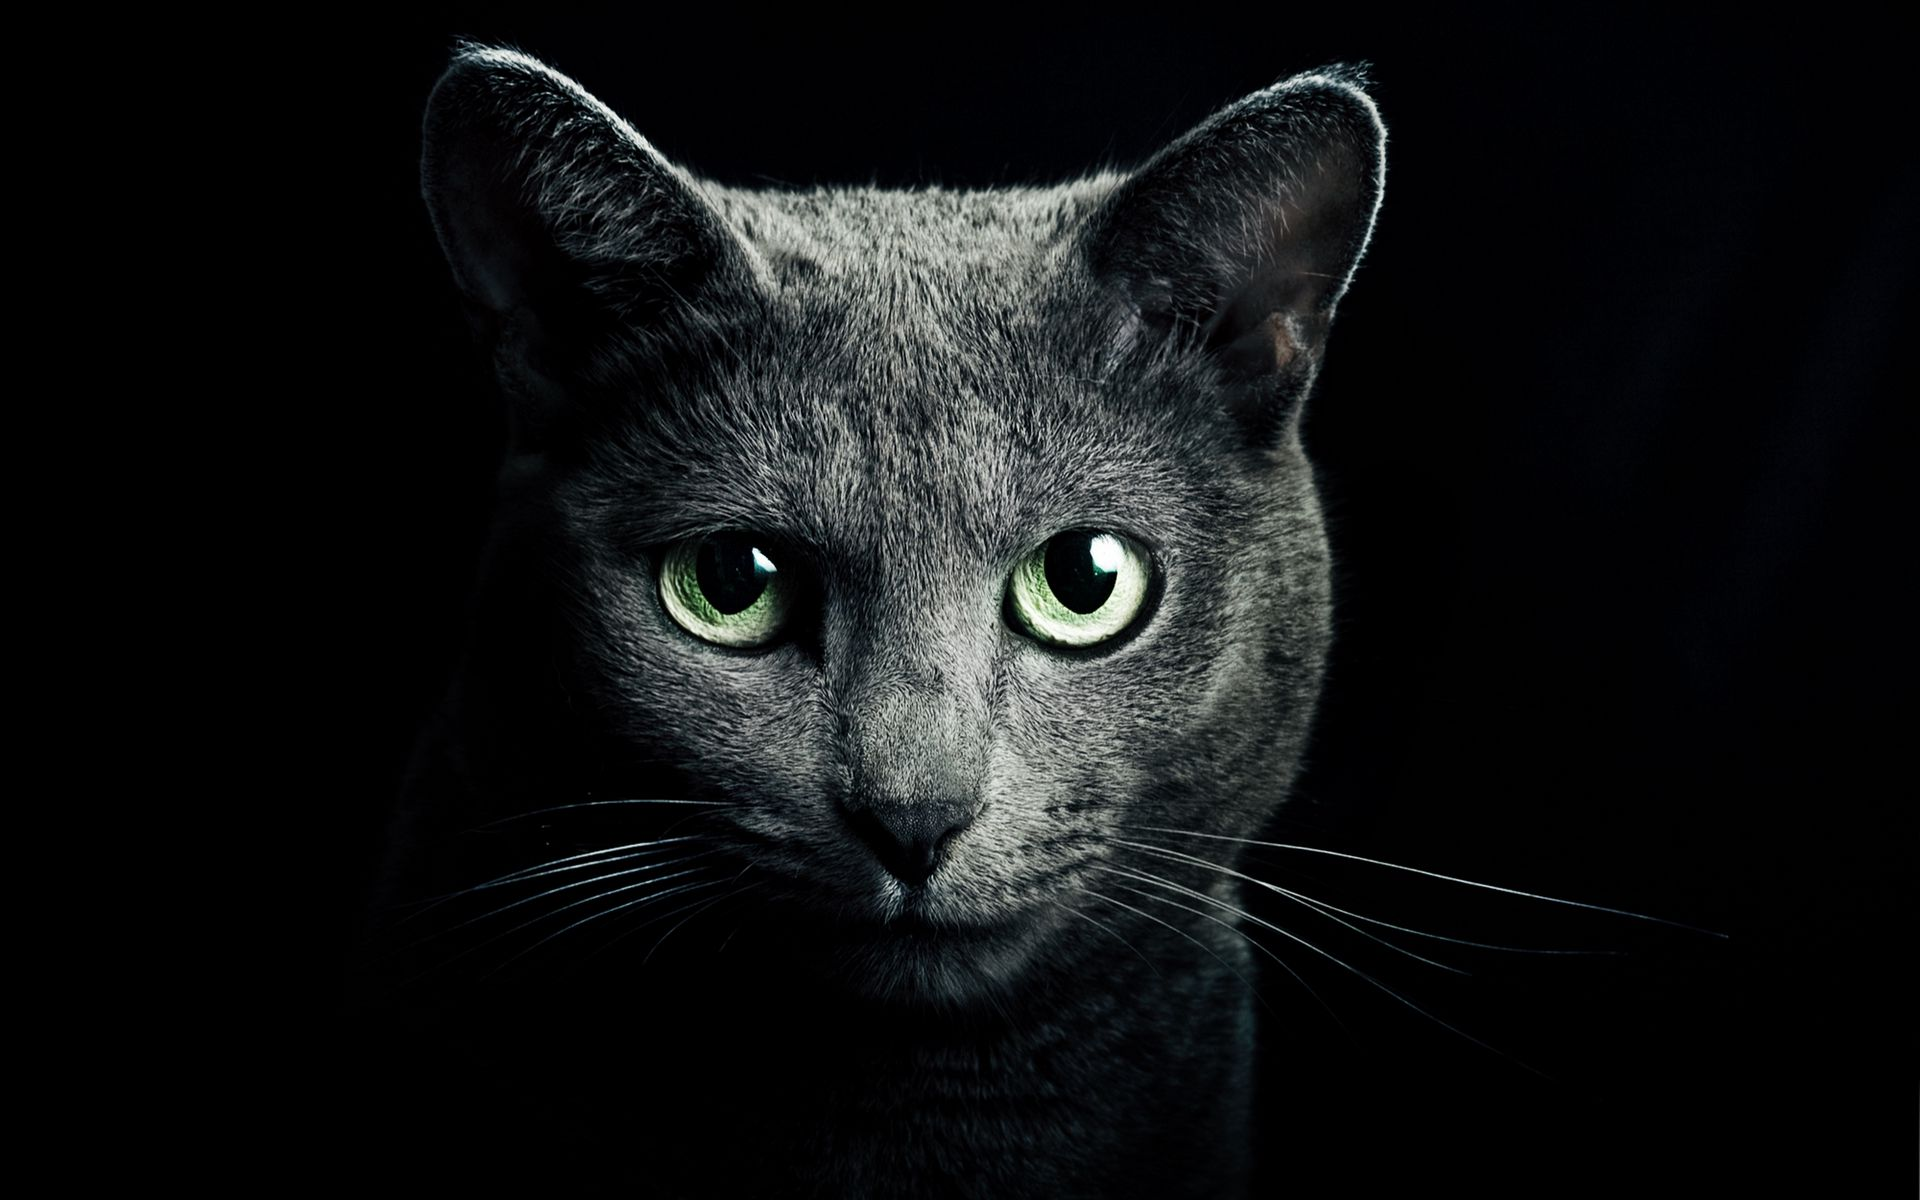 1920x1200 Wallpaper cat, black, breed, russian, blue eyes, green eyes, black background